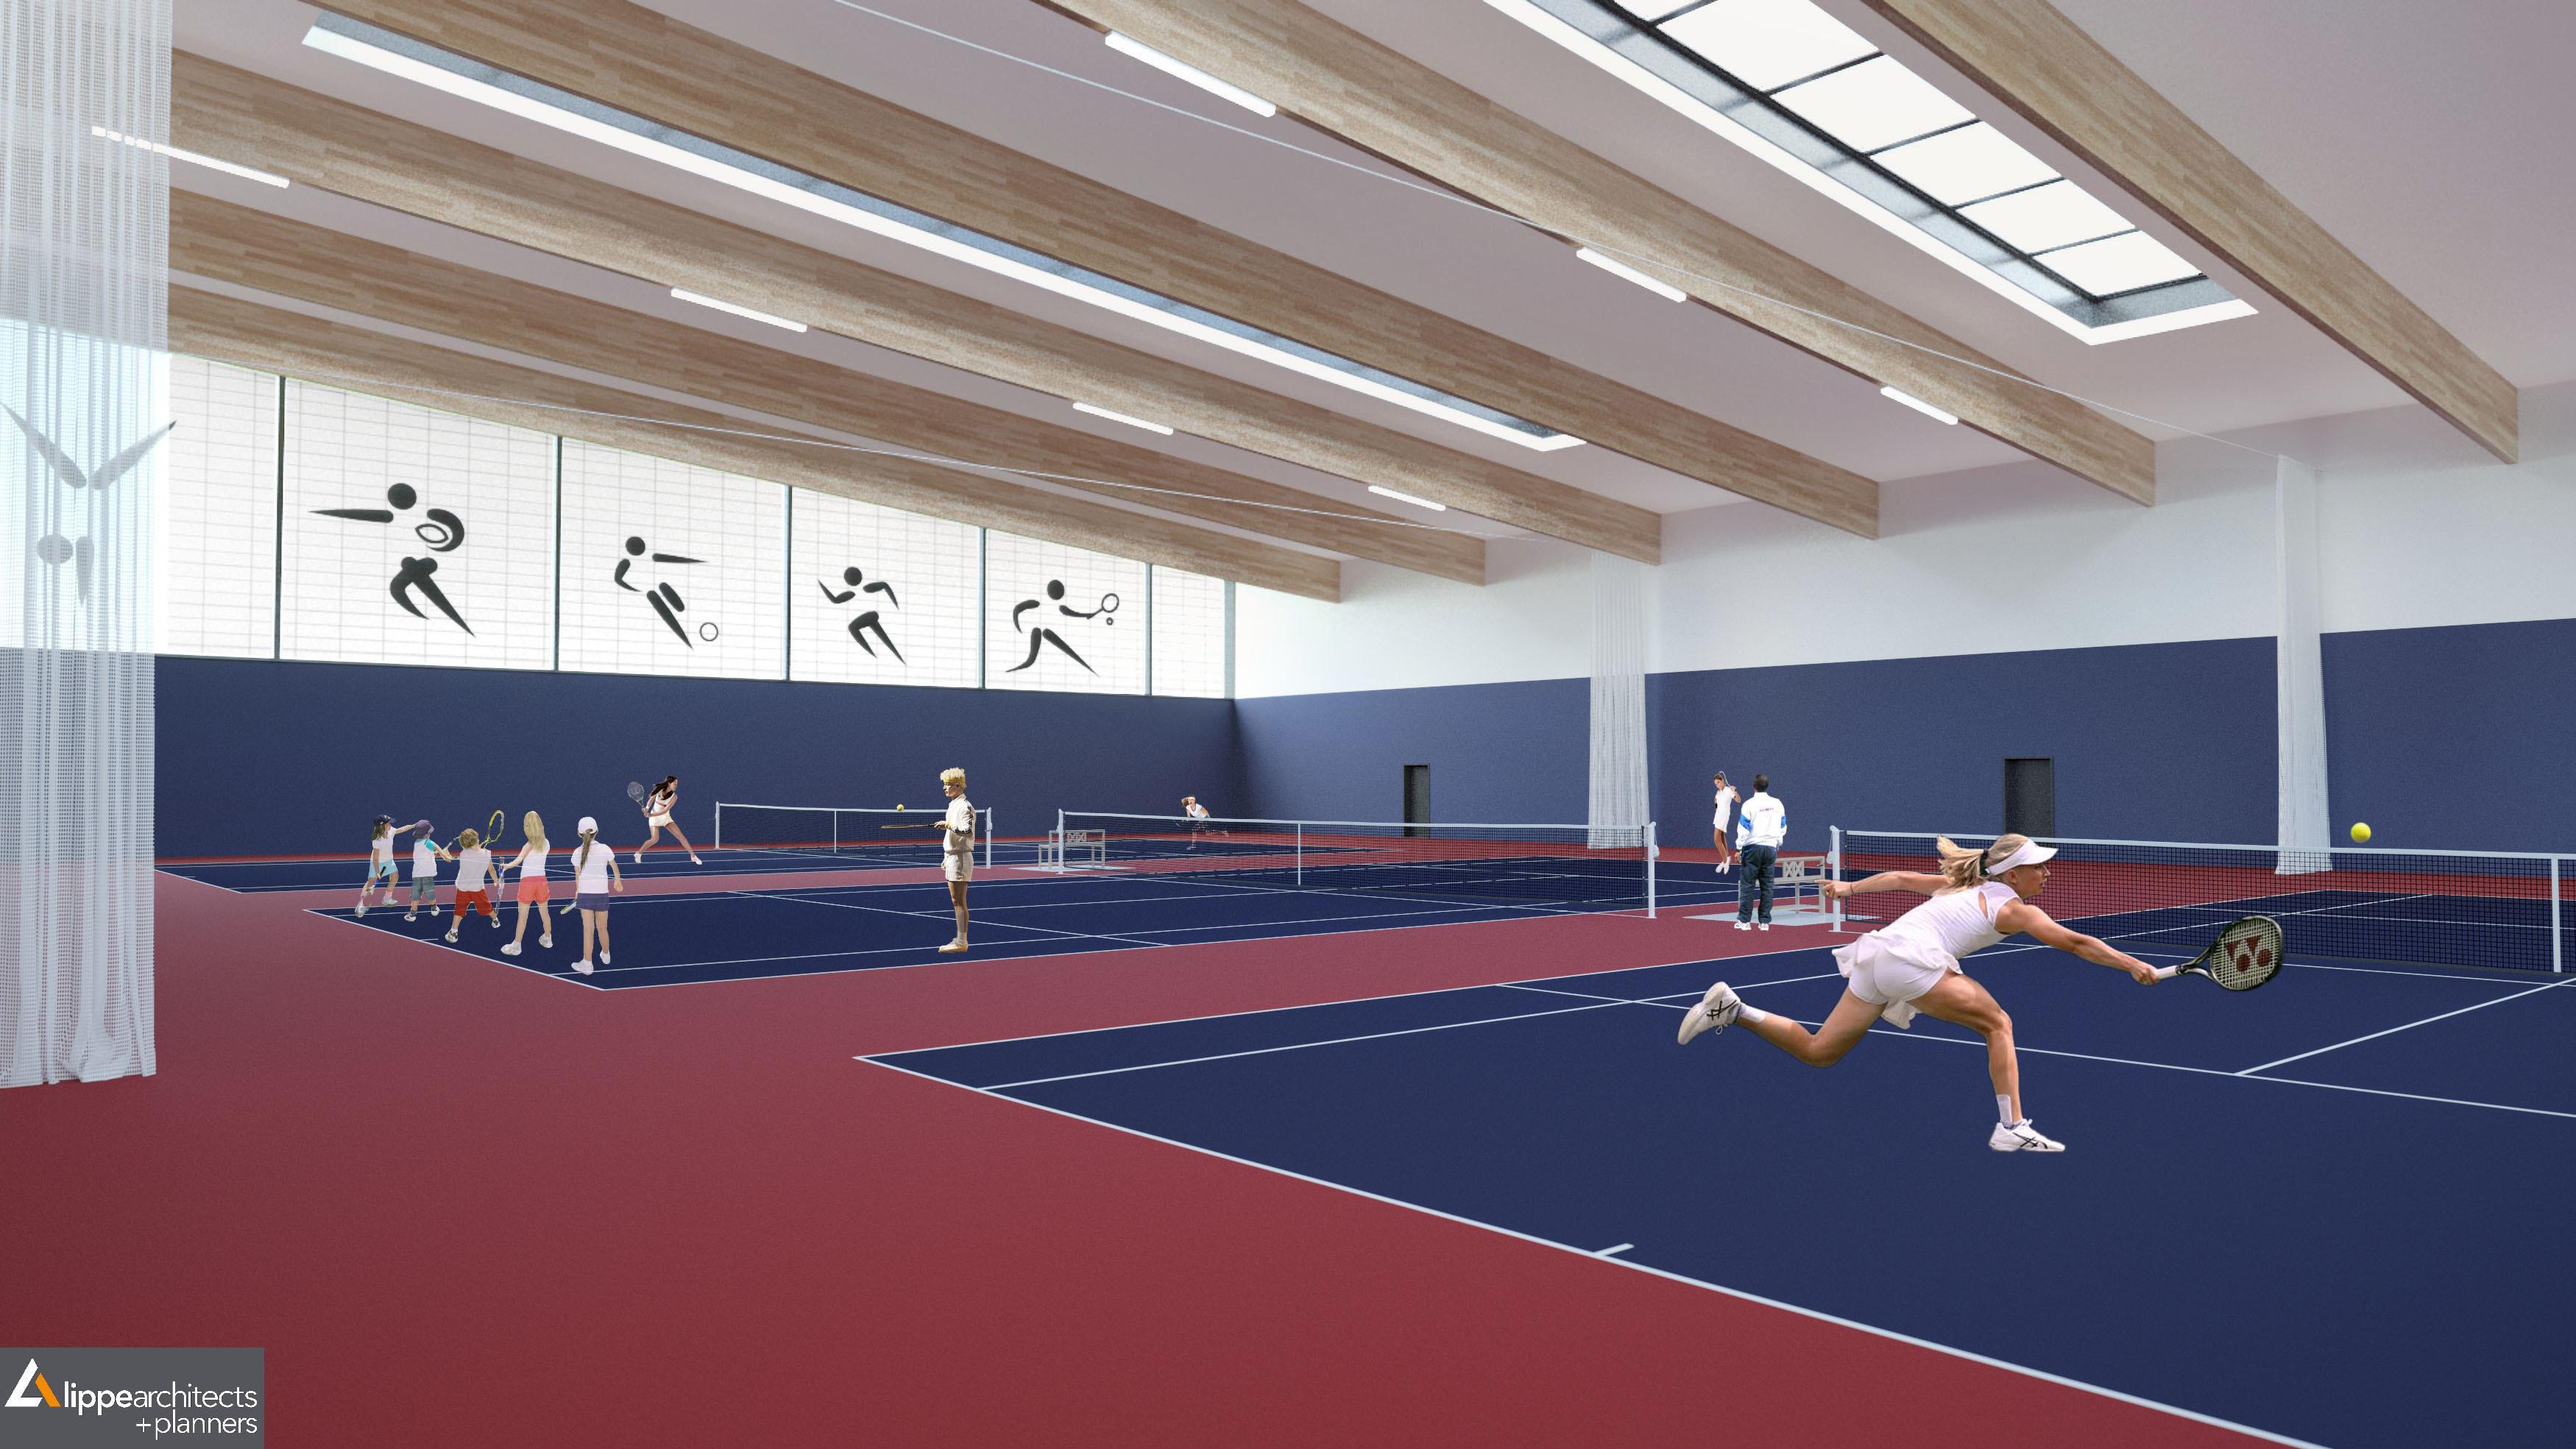 An artist impression of the Garioch Sports Centre.